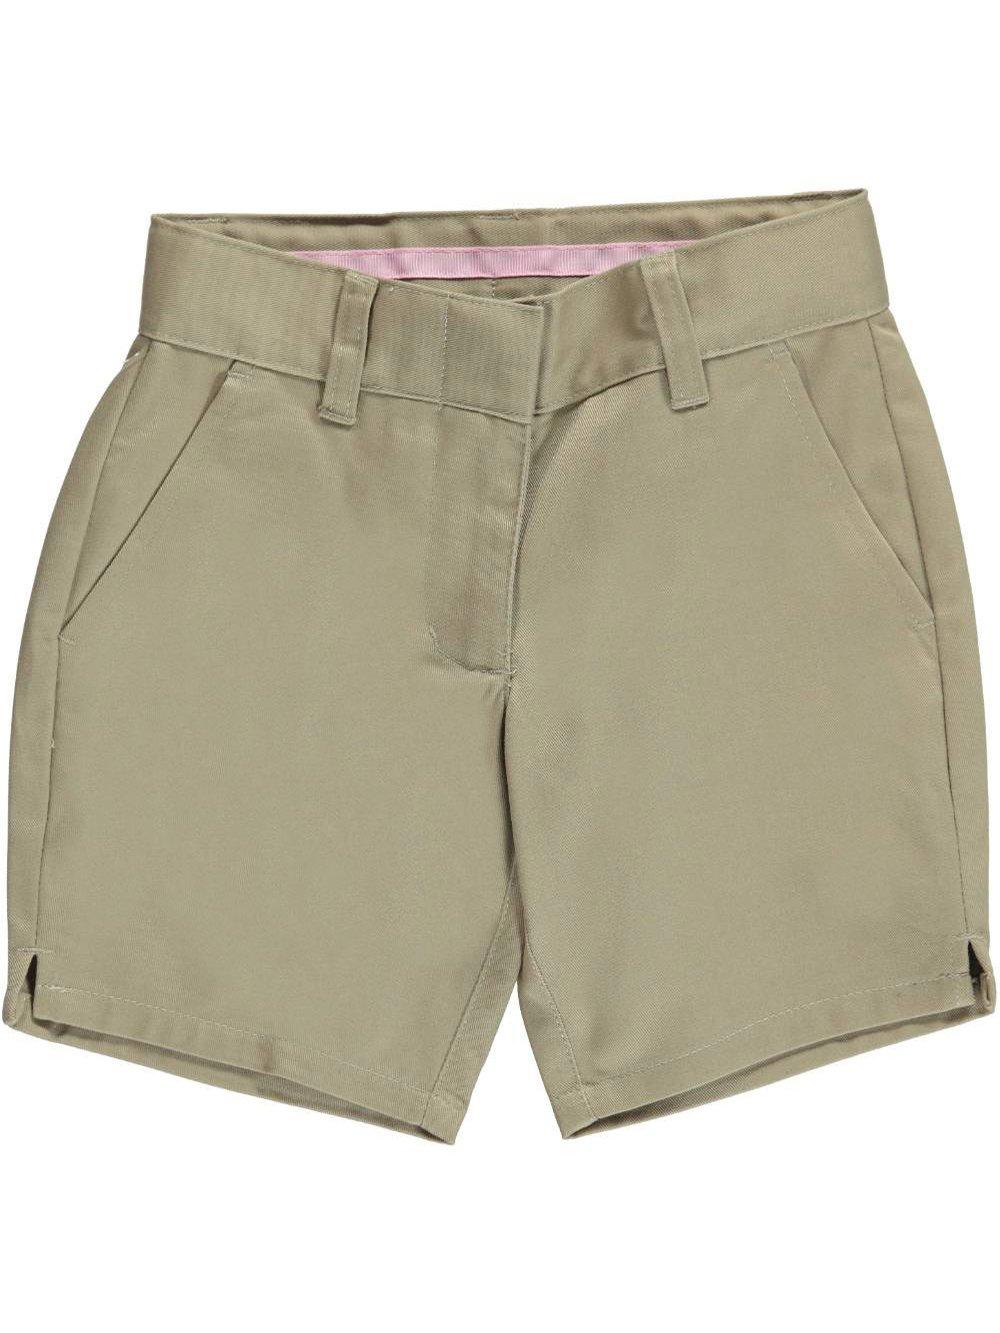 Universal Little Girls' Flat Front Shorts - Khaki, 5